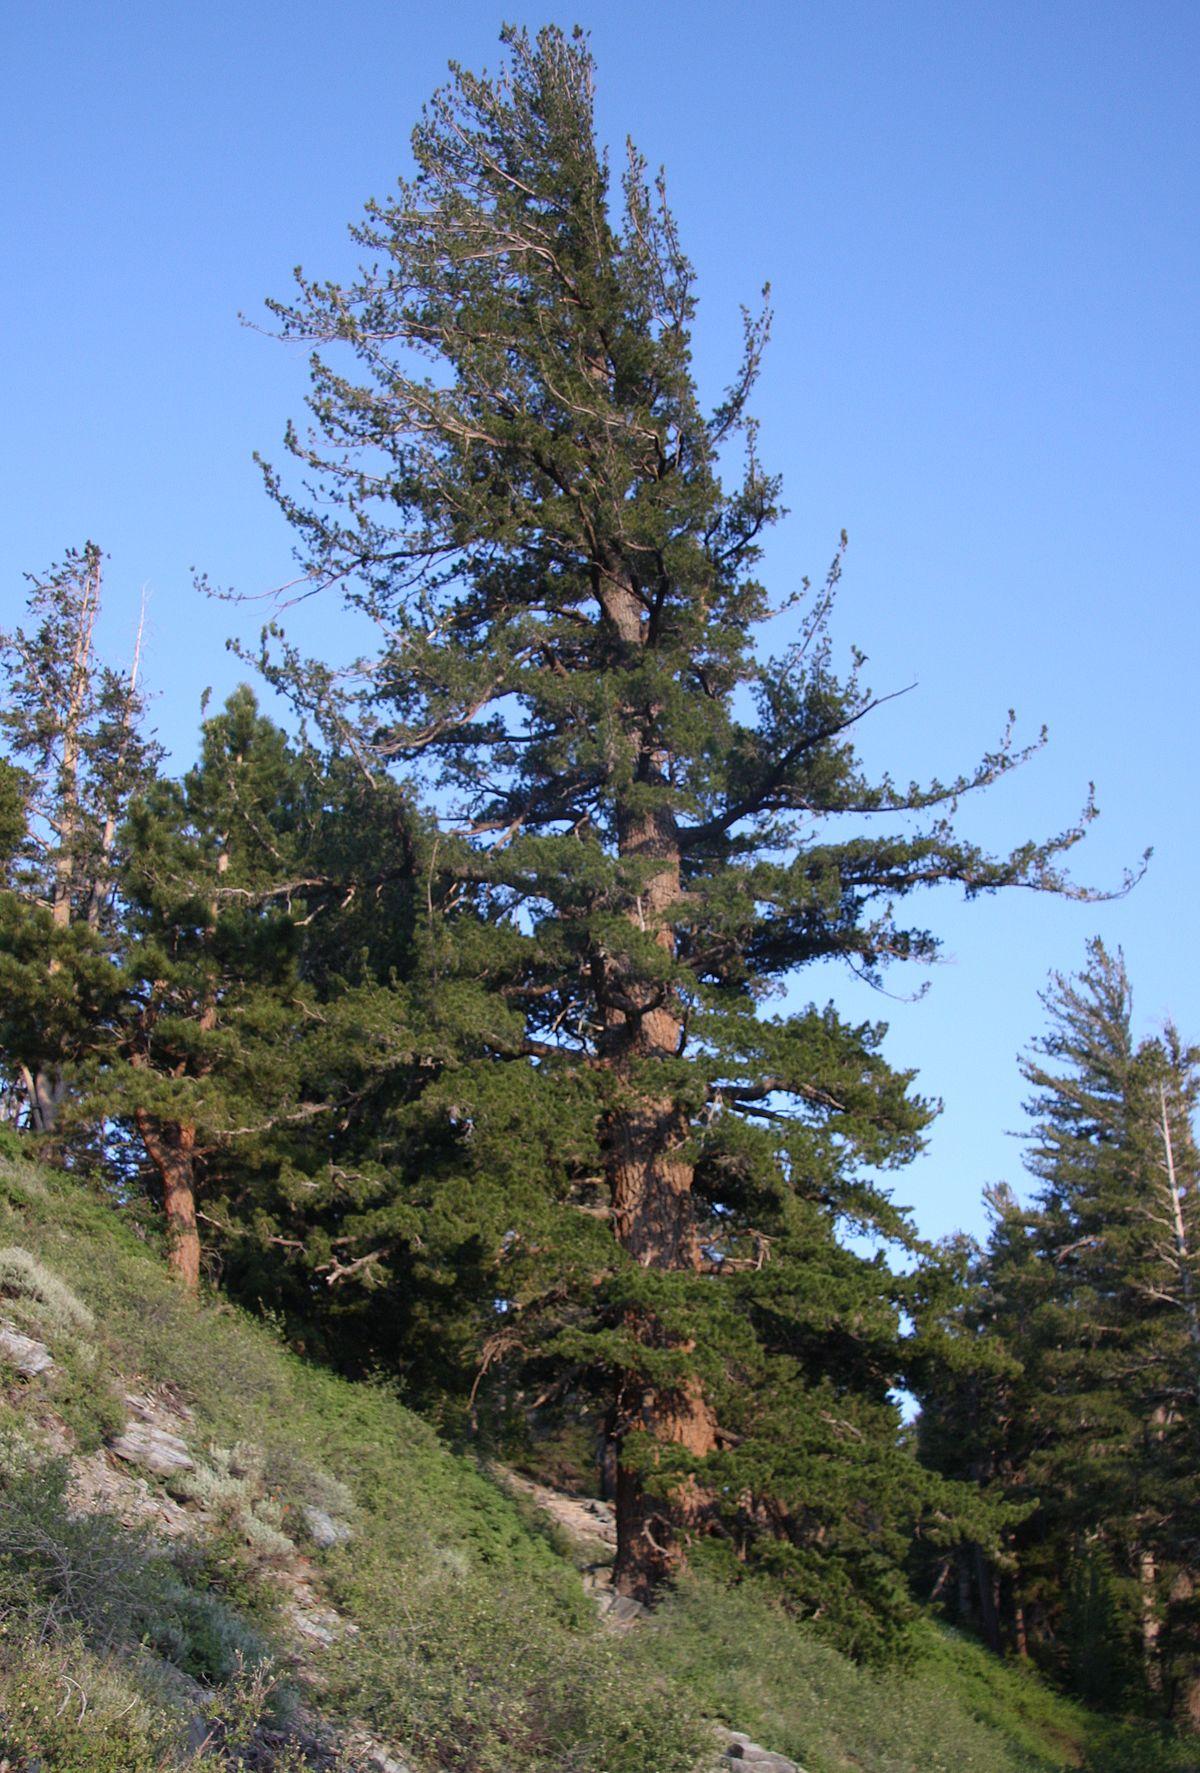 Pinus monticola - Wikispecies